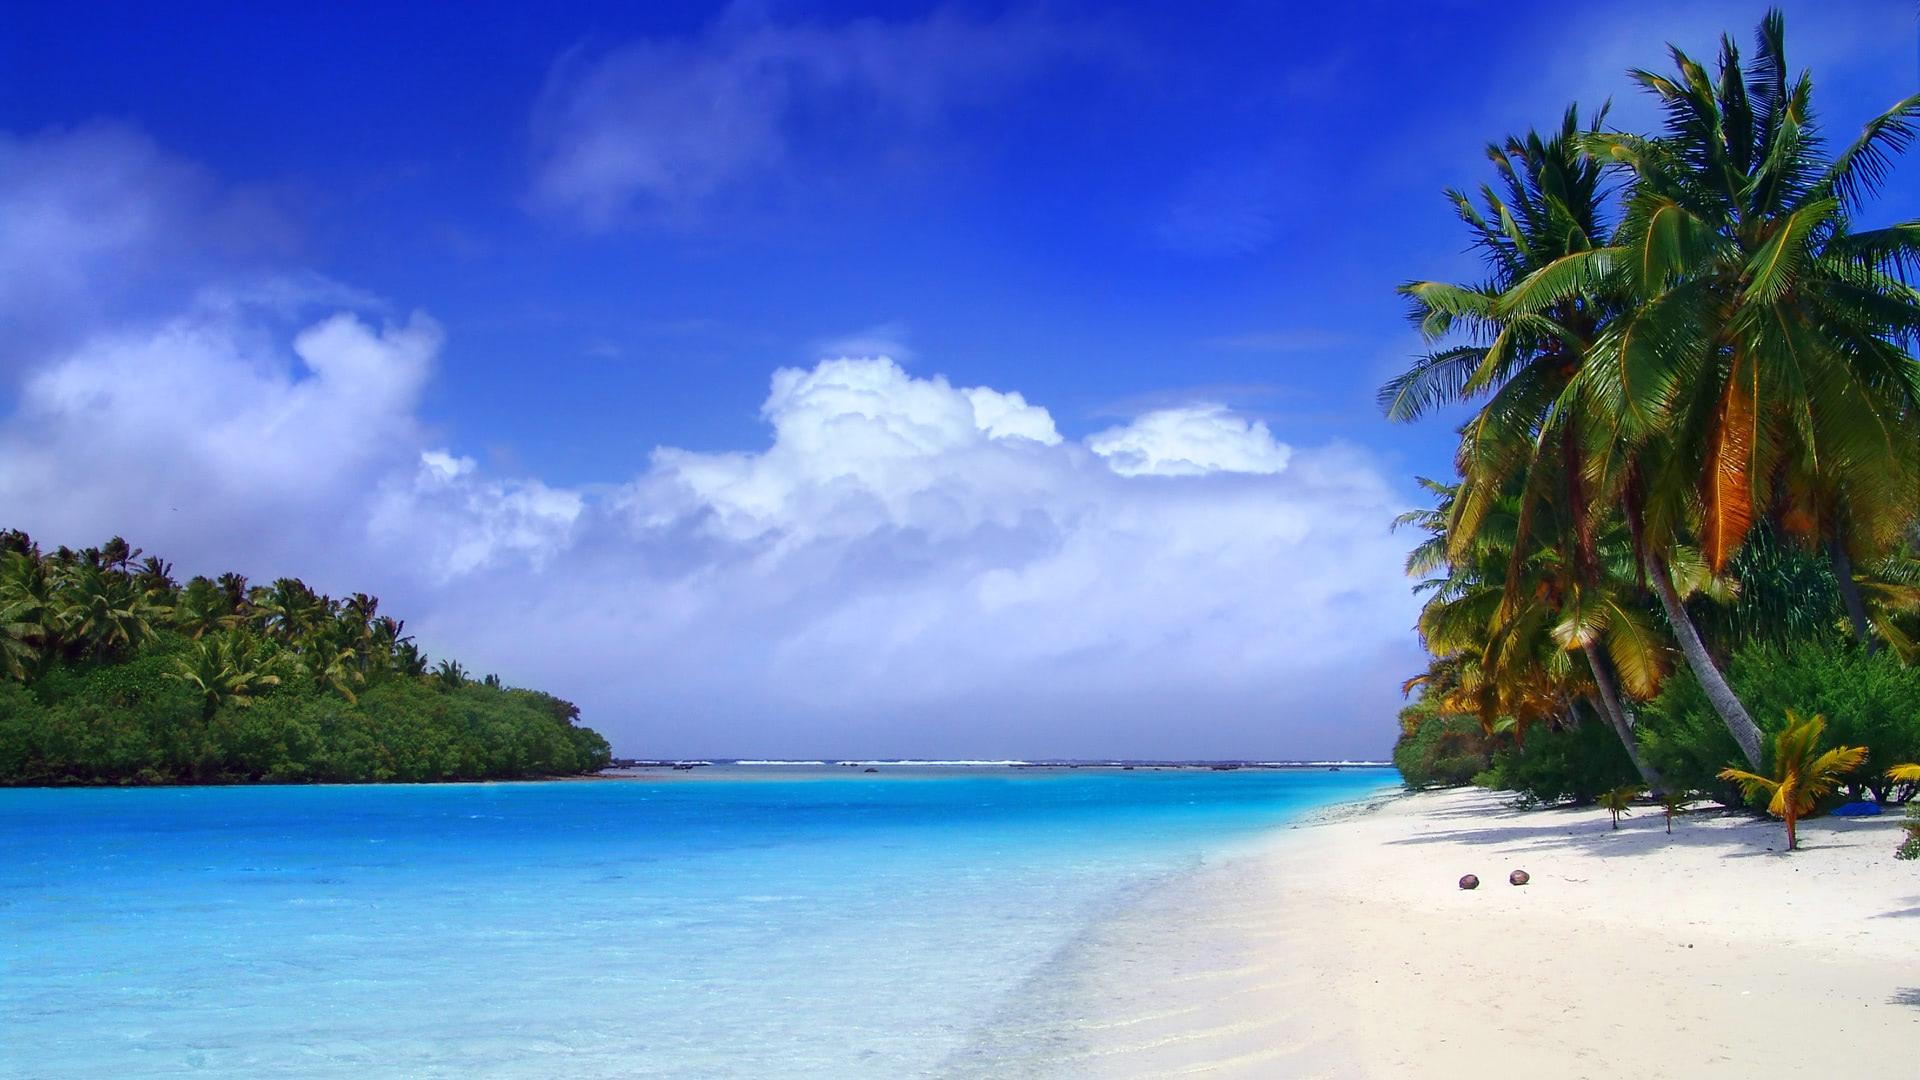 Paradise Beach Wallpaper Beach Wallpapers